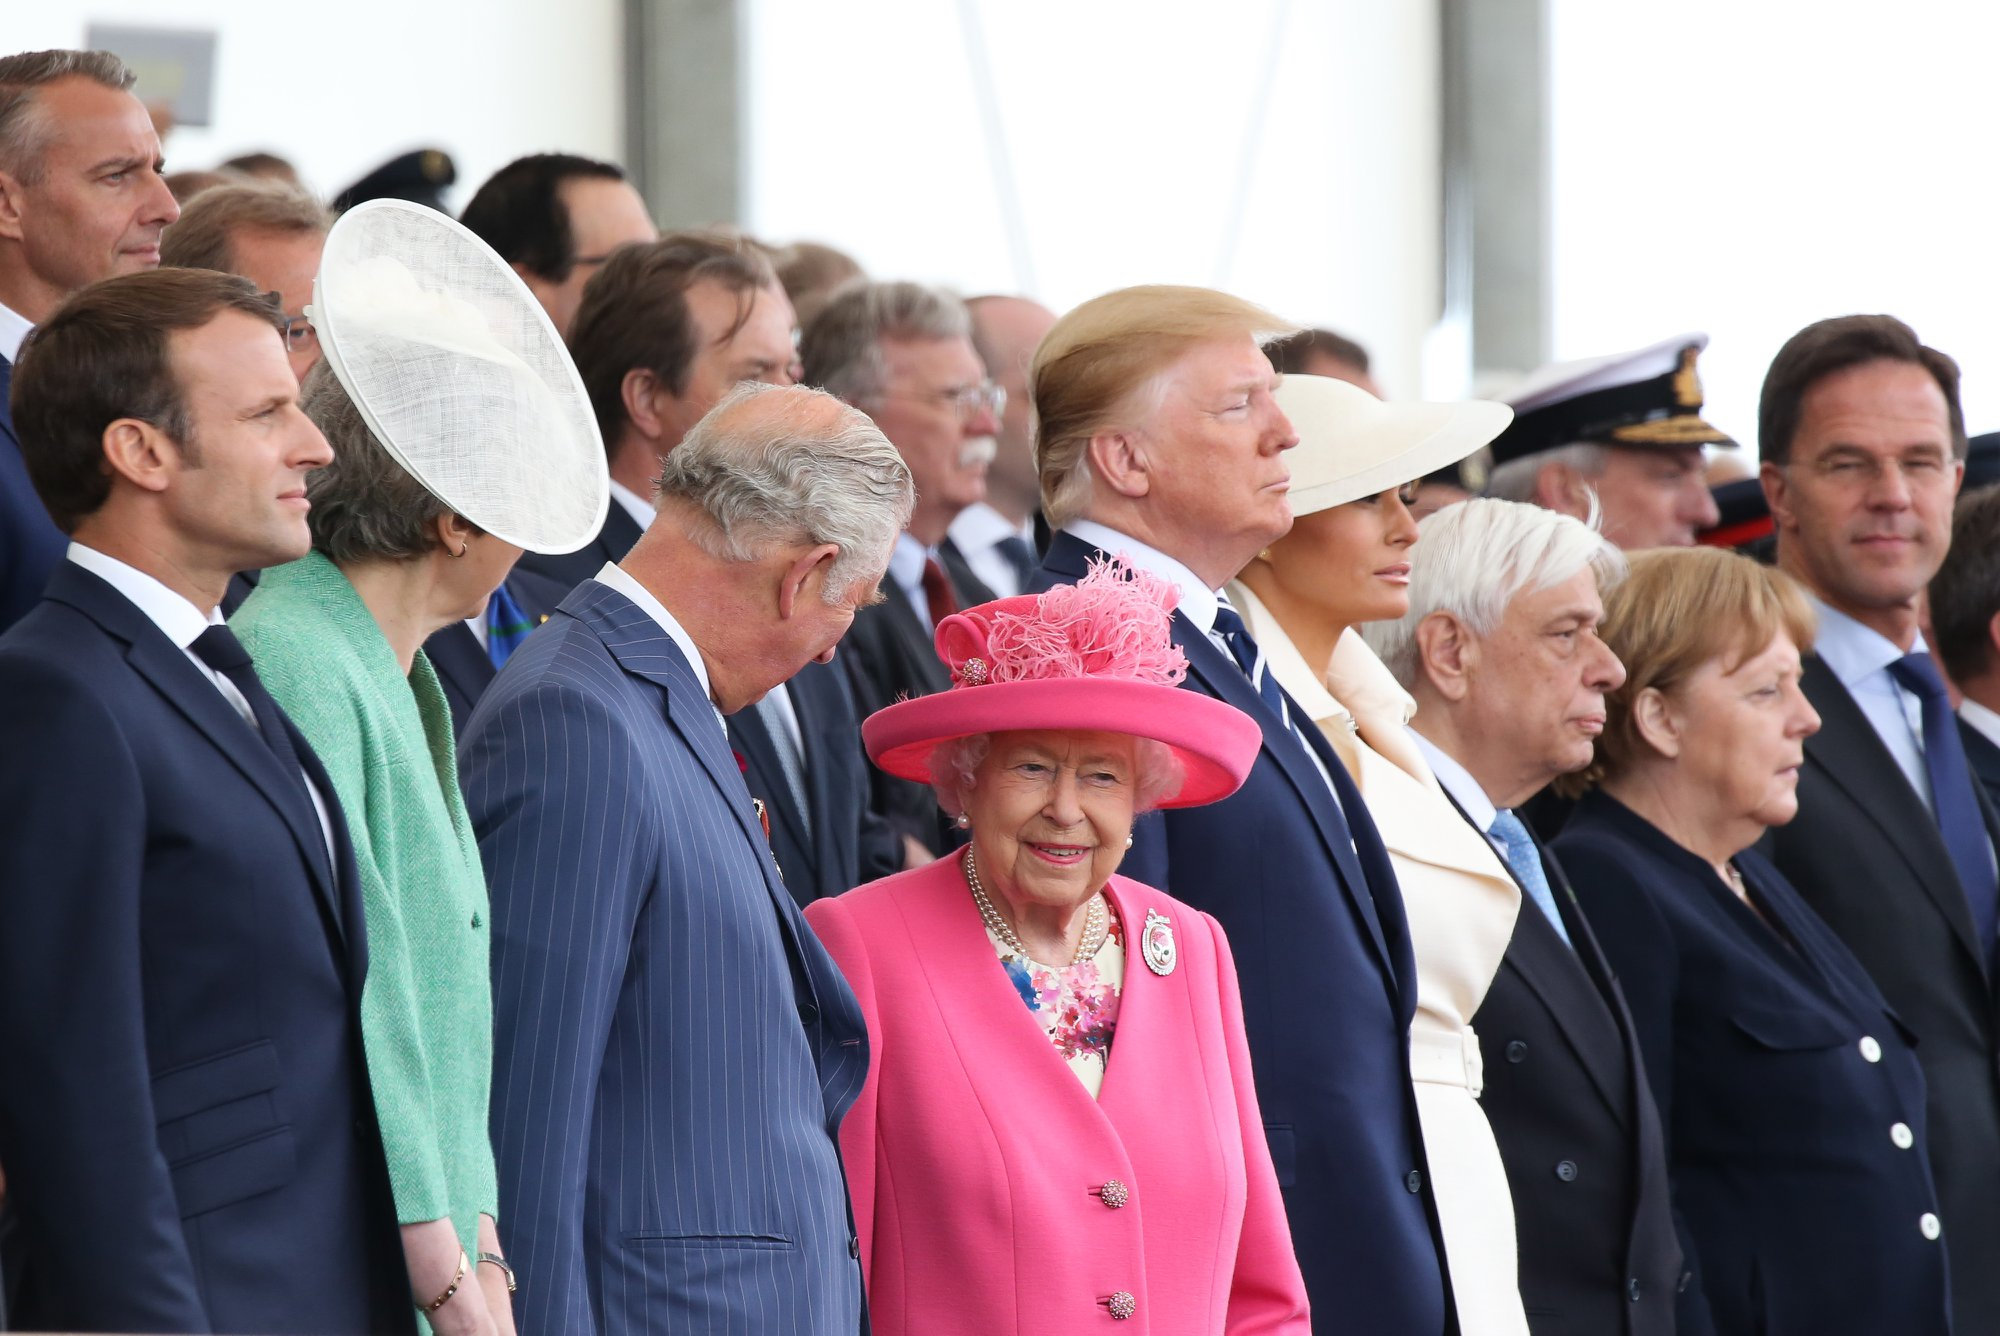 ". In her speech Queen Elizabeth said ""My generation was very resilient."""